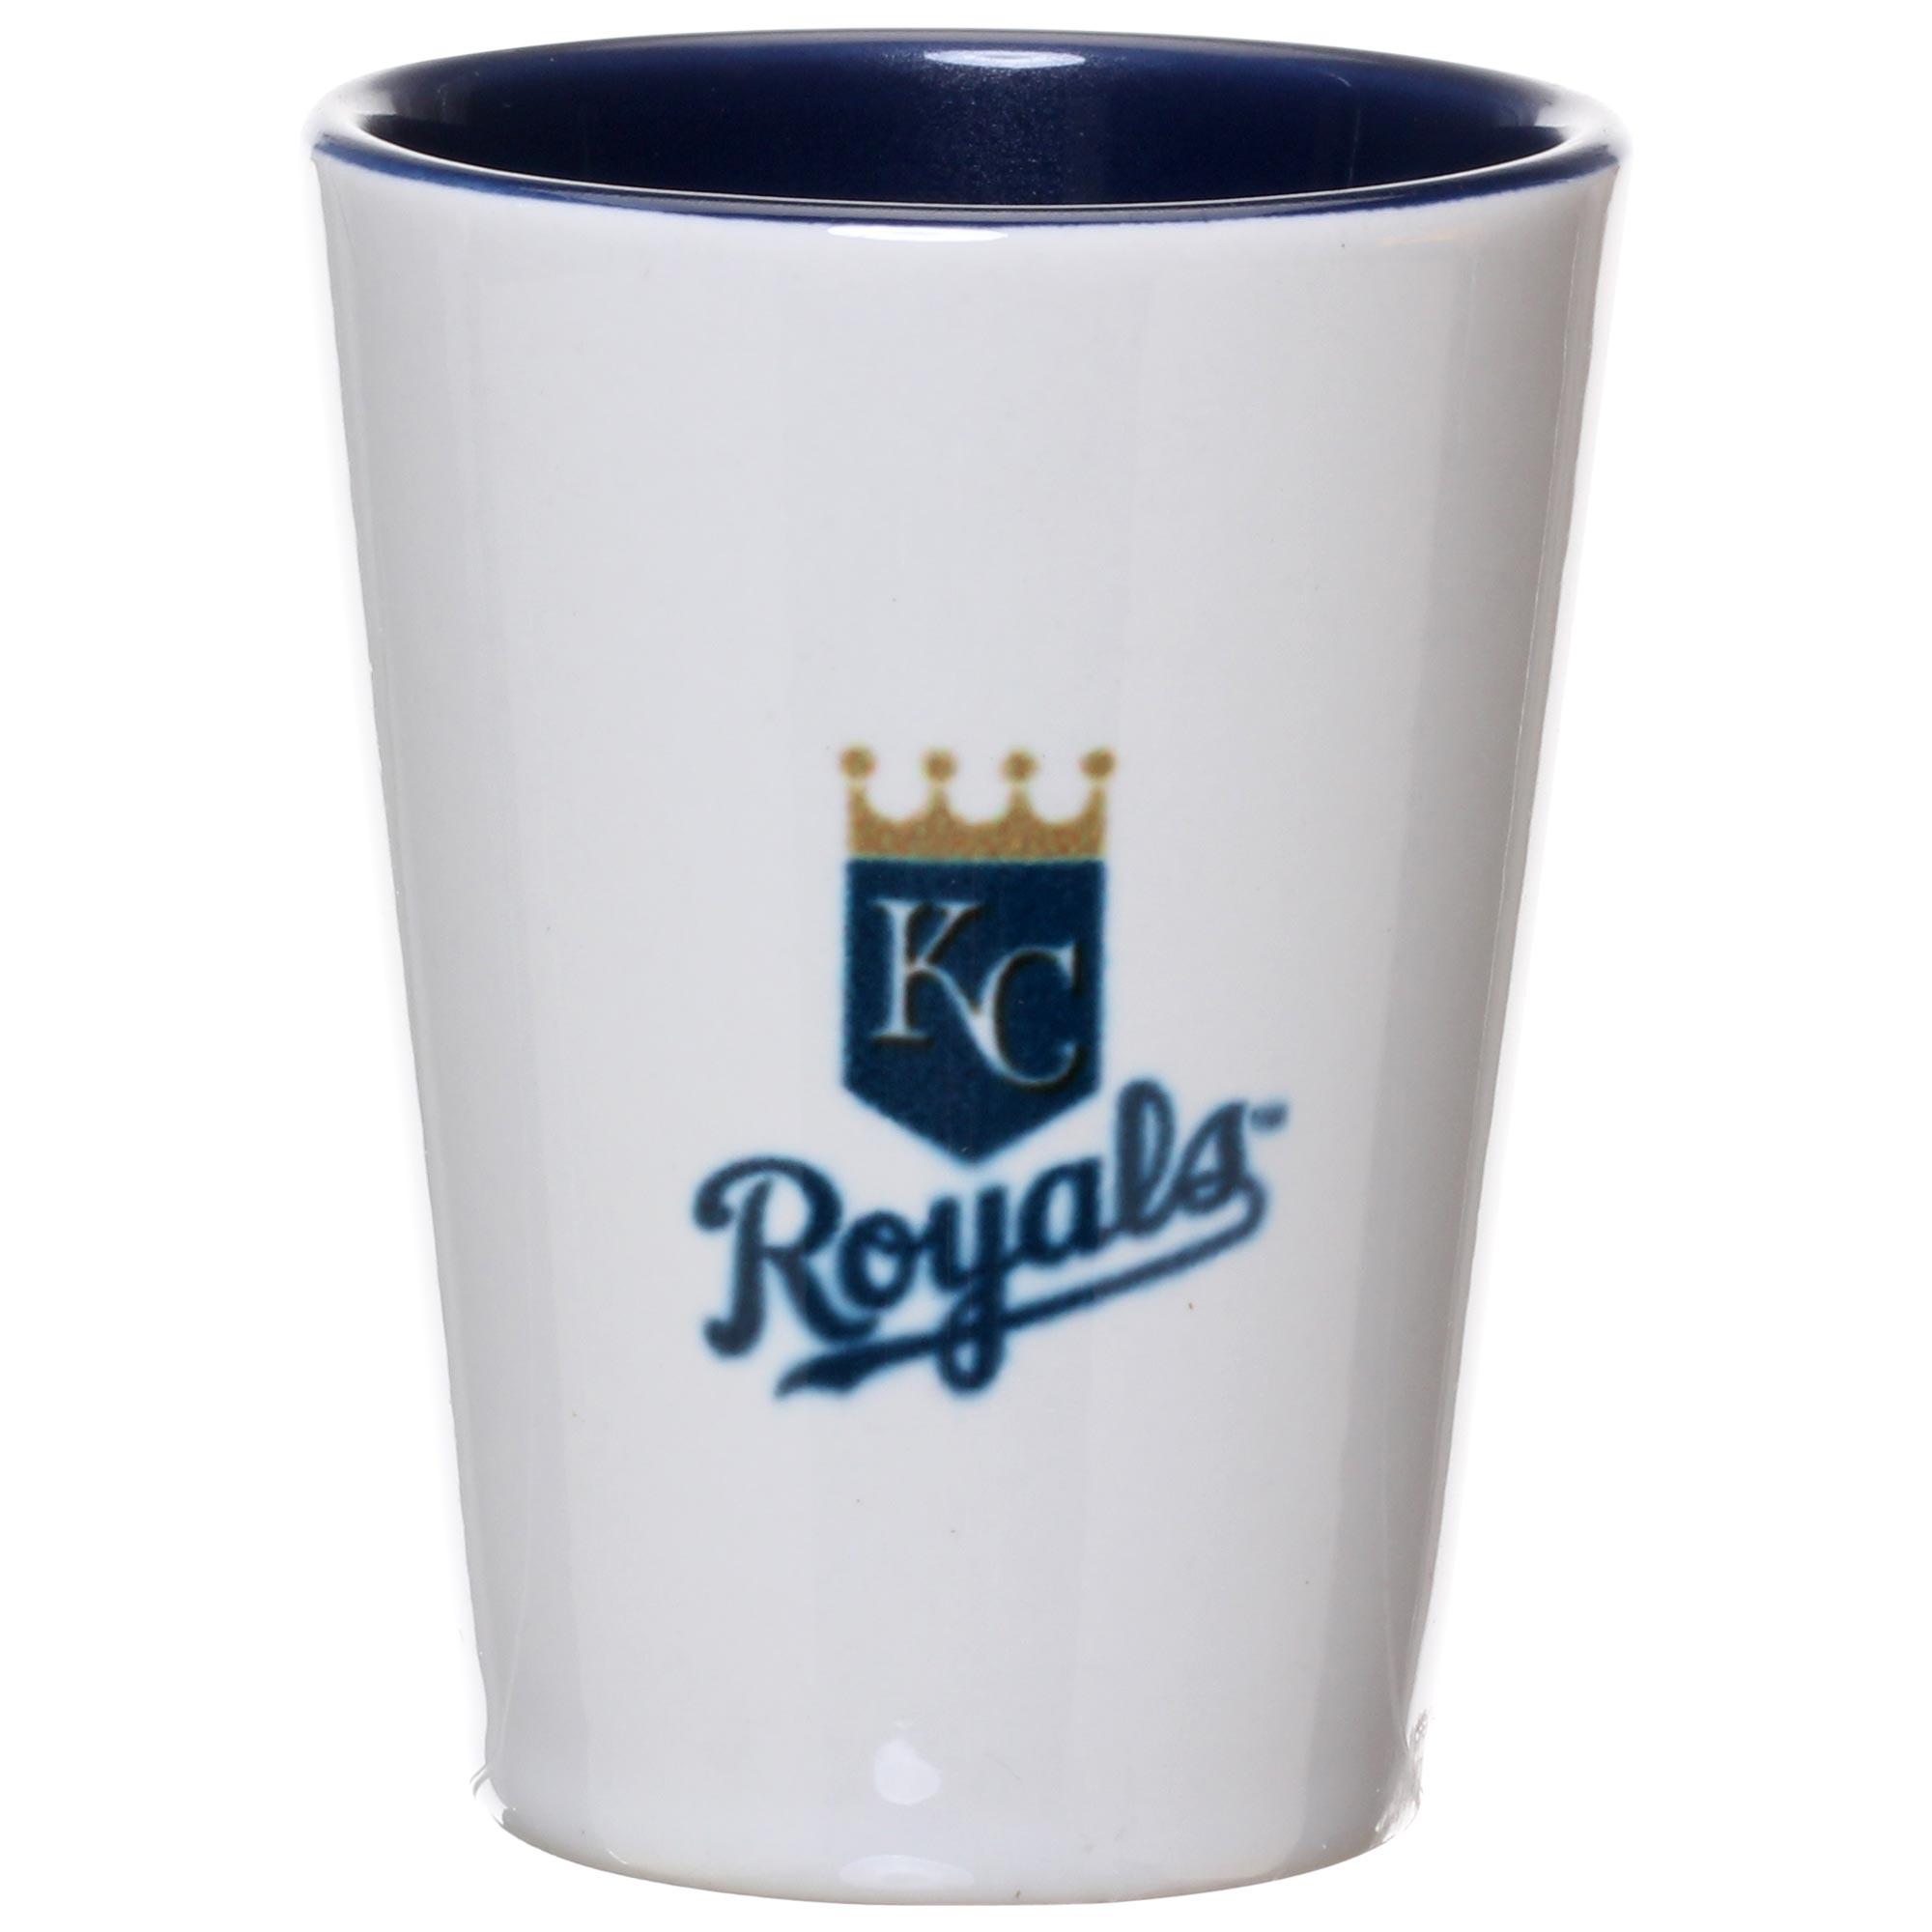 Kansas City Royals 2oz. Inner Color Ceramic Cup - No Size